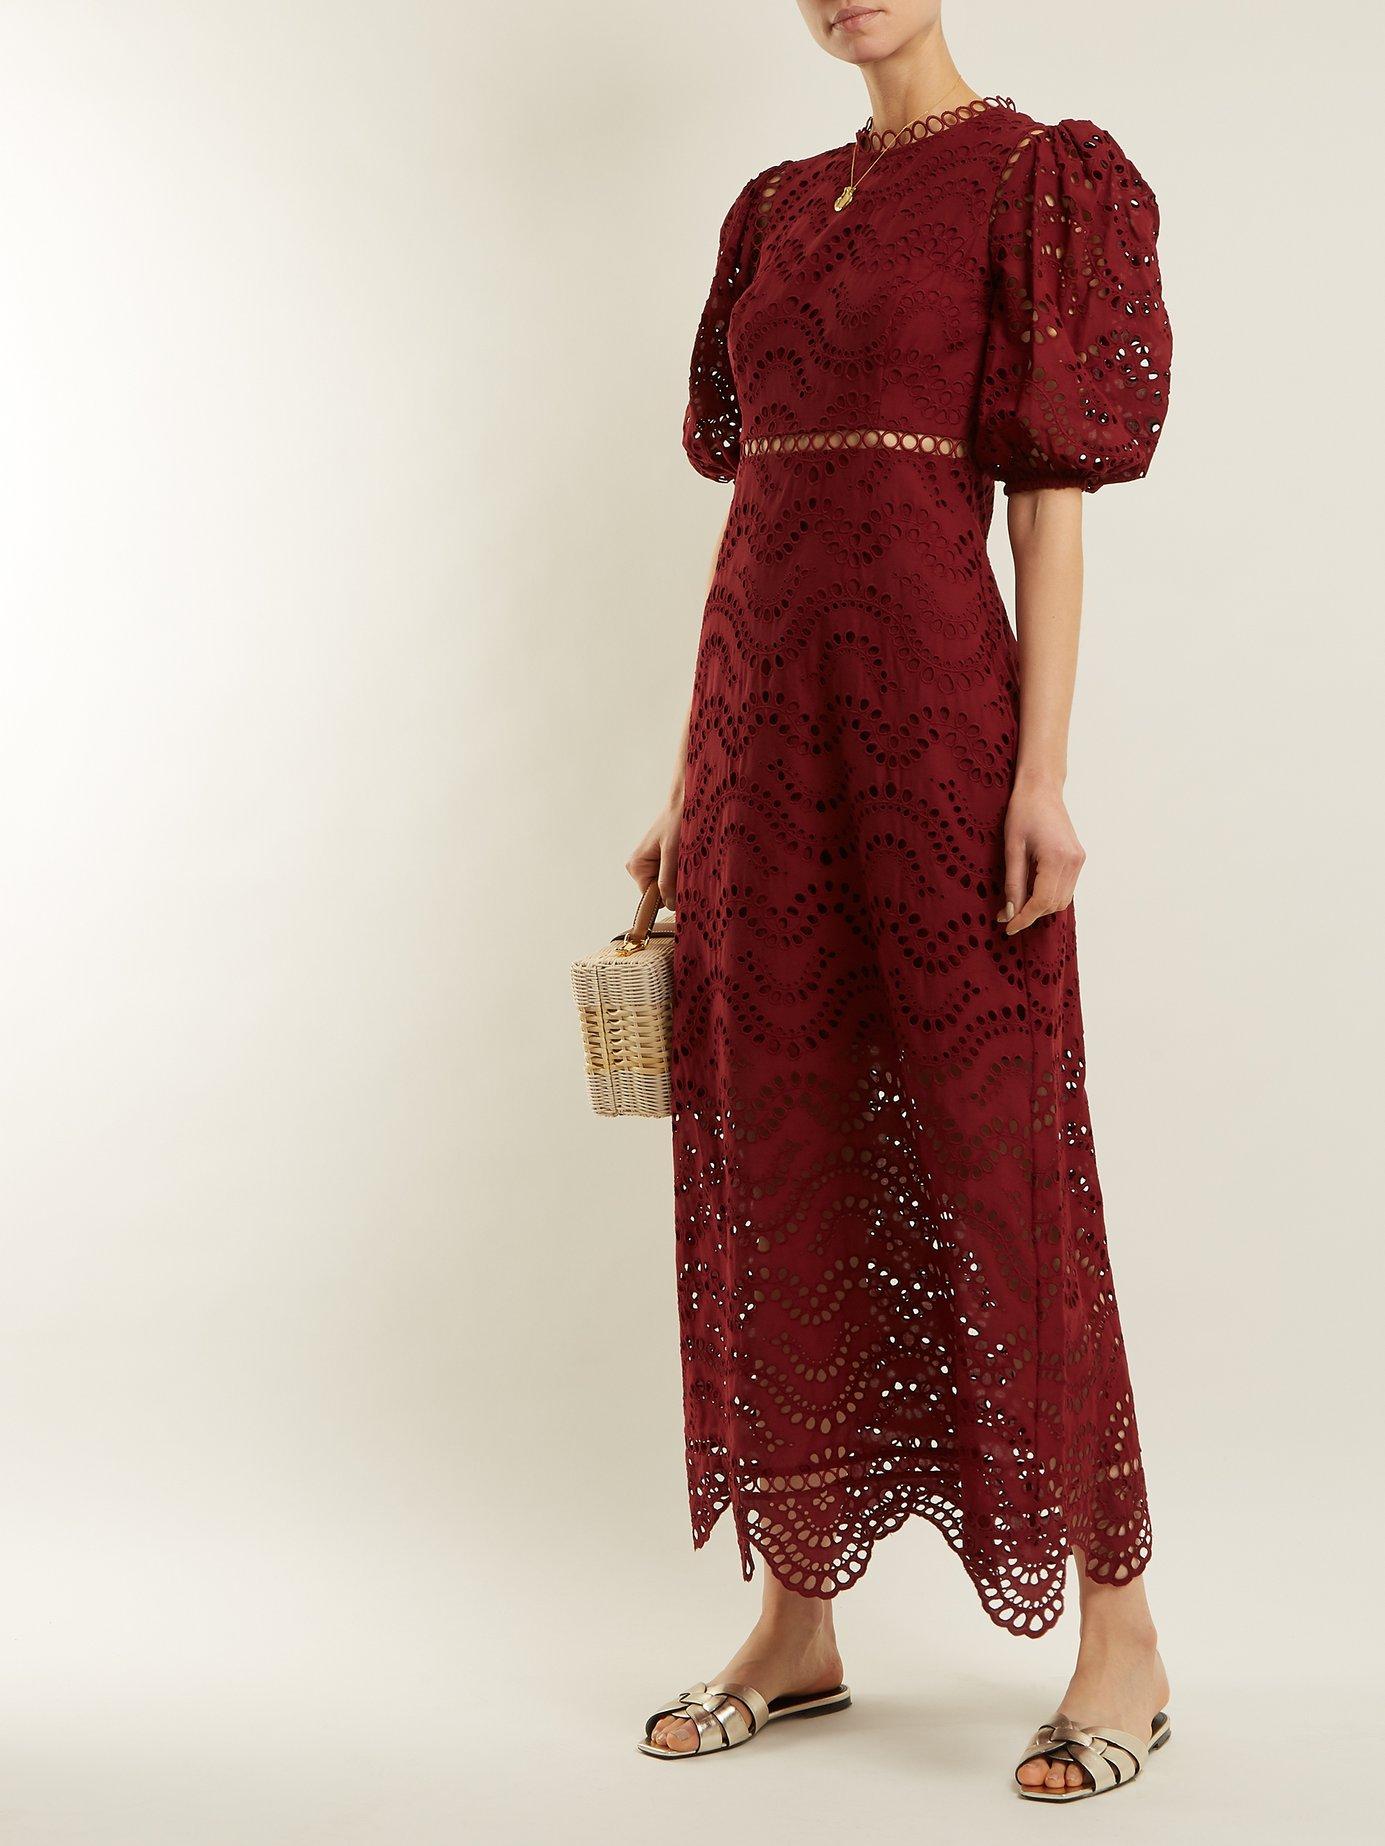 Jaya Wave cotton dress by Zimmermann